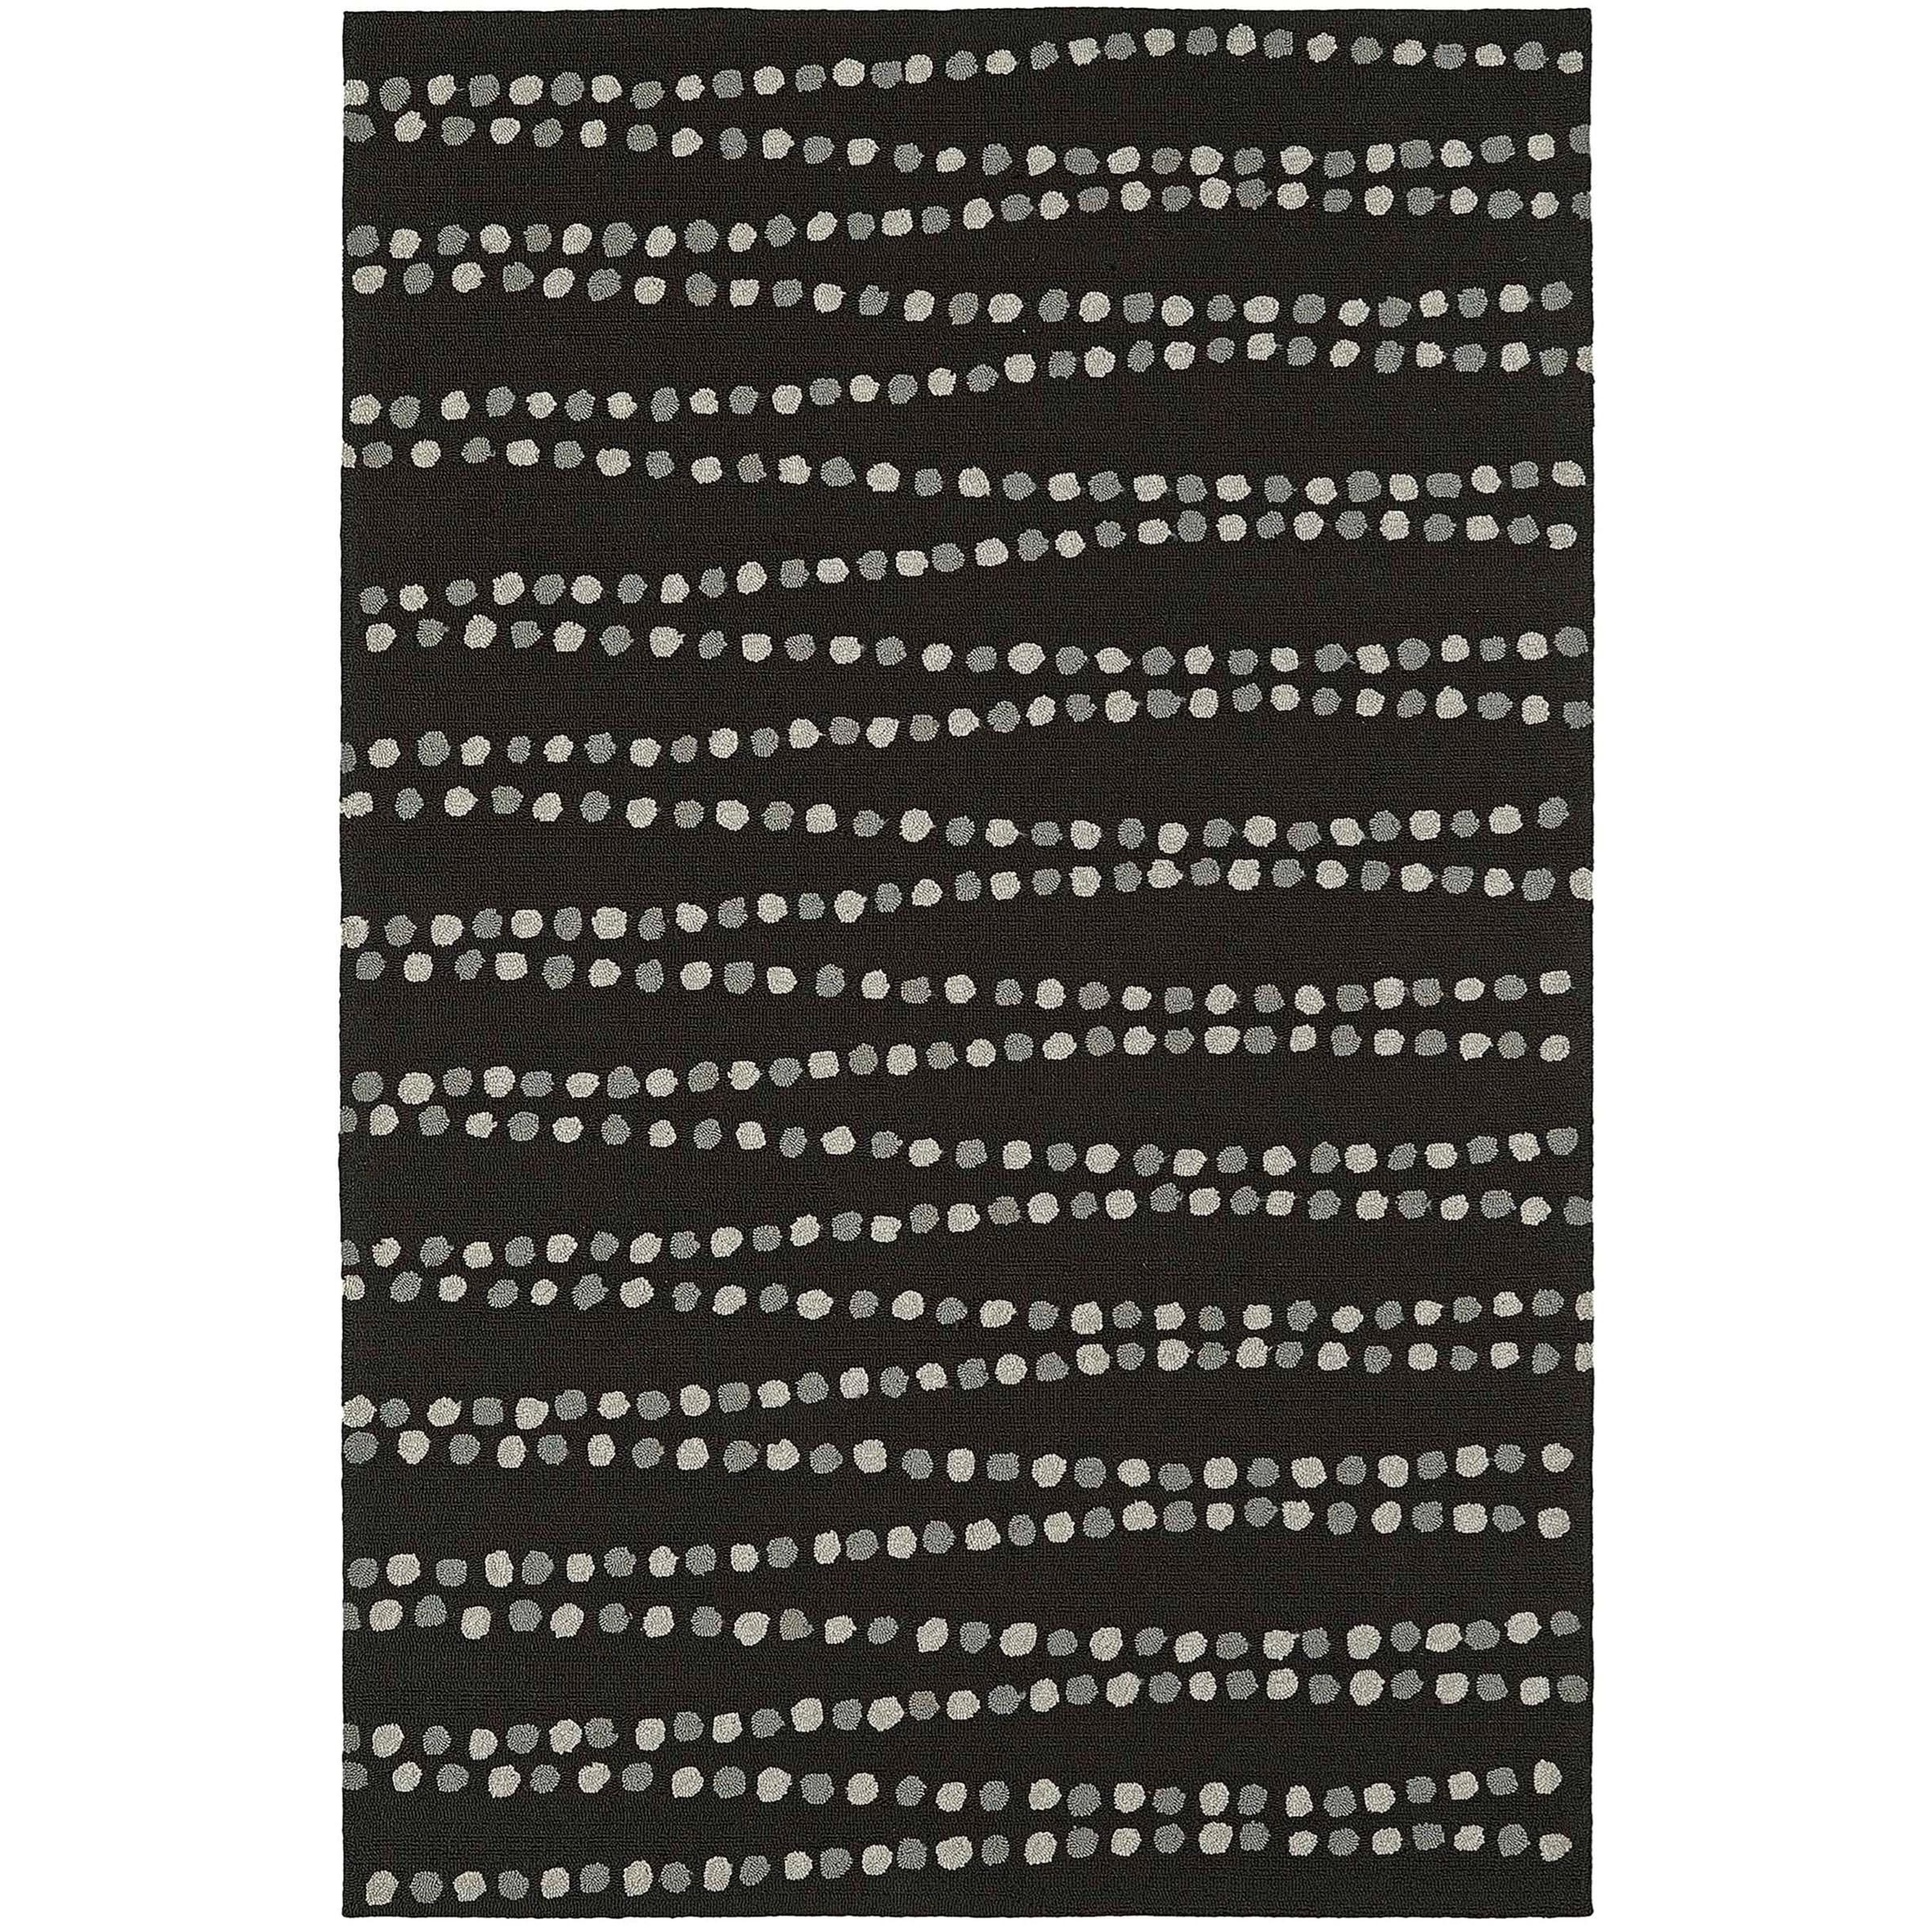 Cabana Black 8'X10' Rug by Dalyn at Fashion Furniture